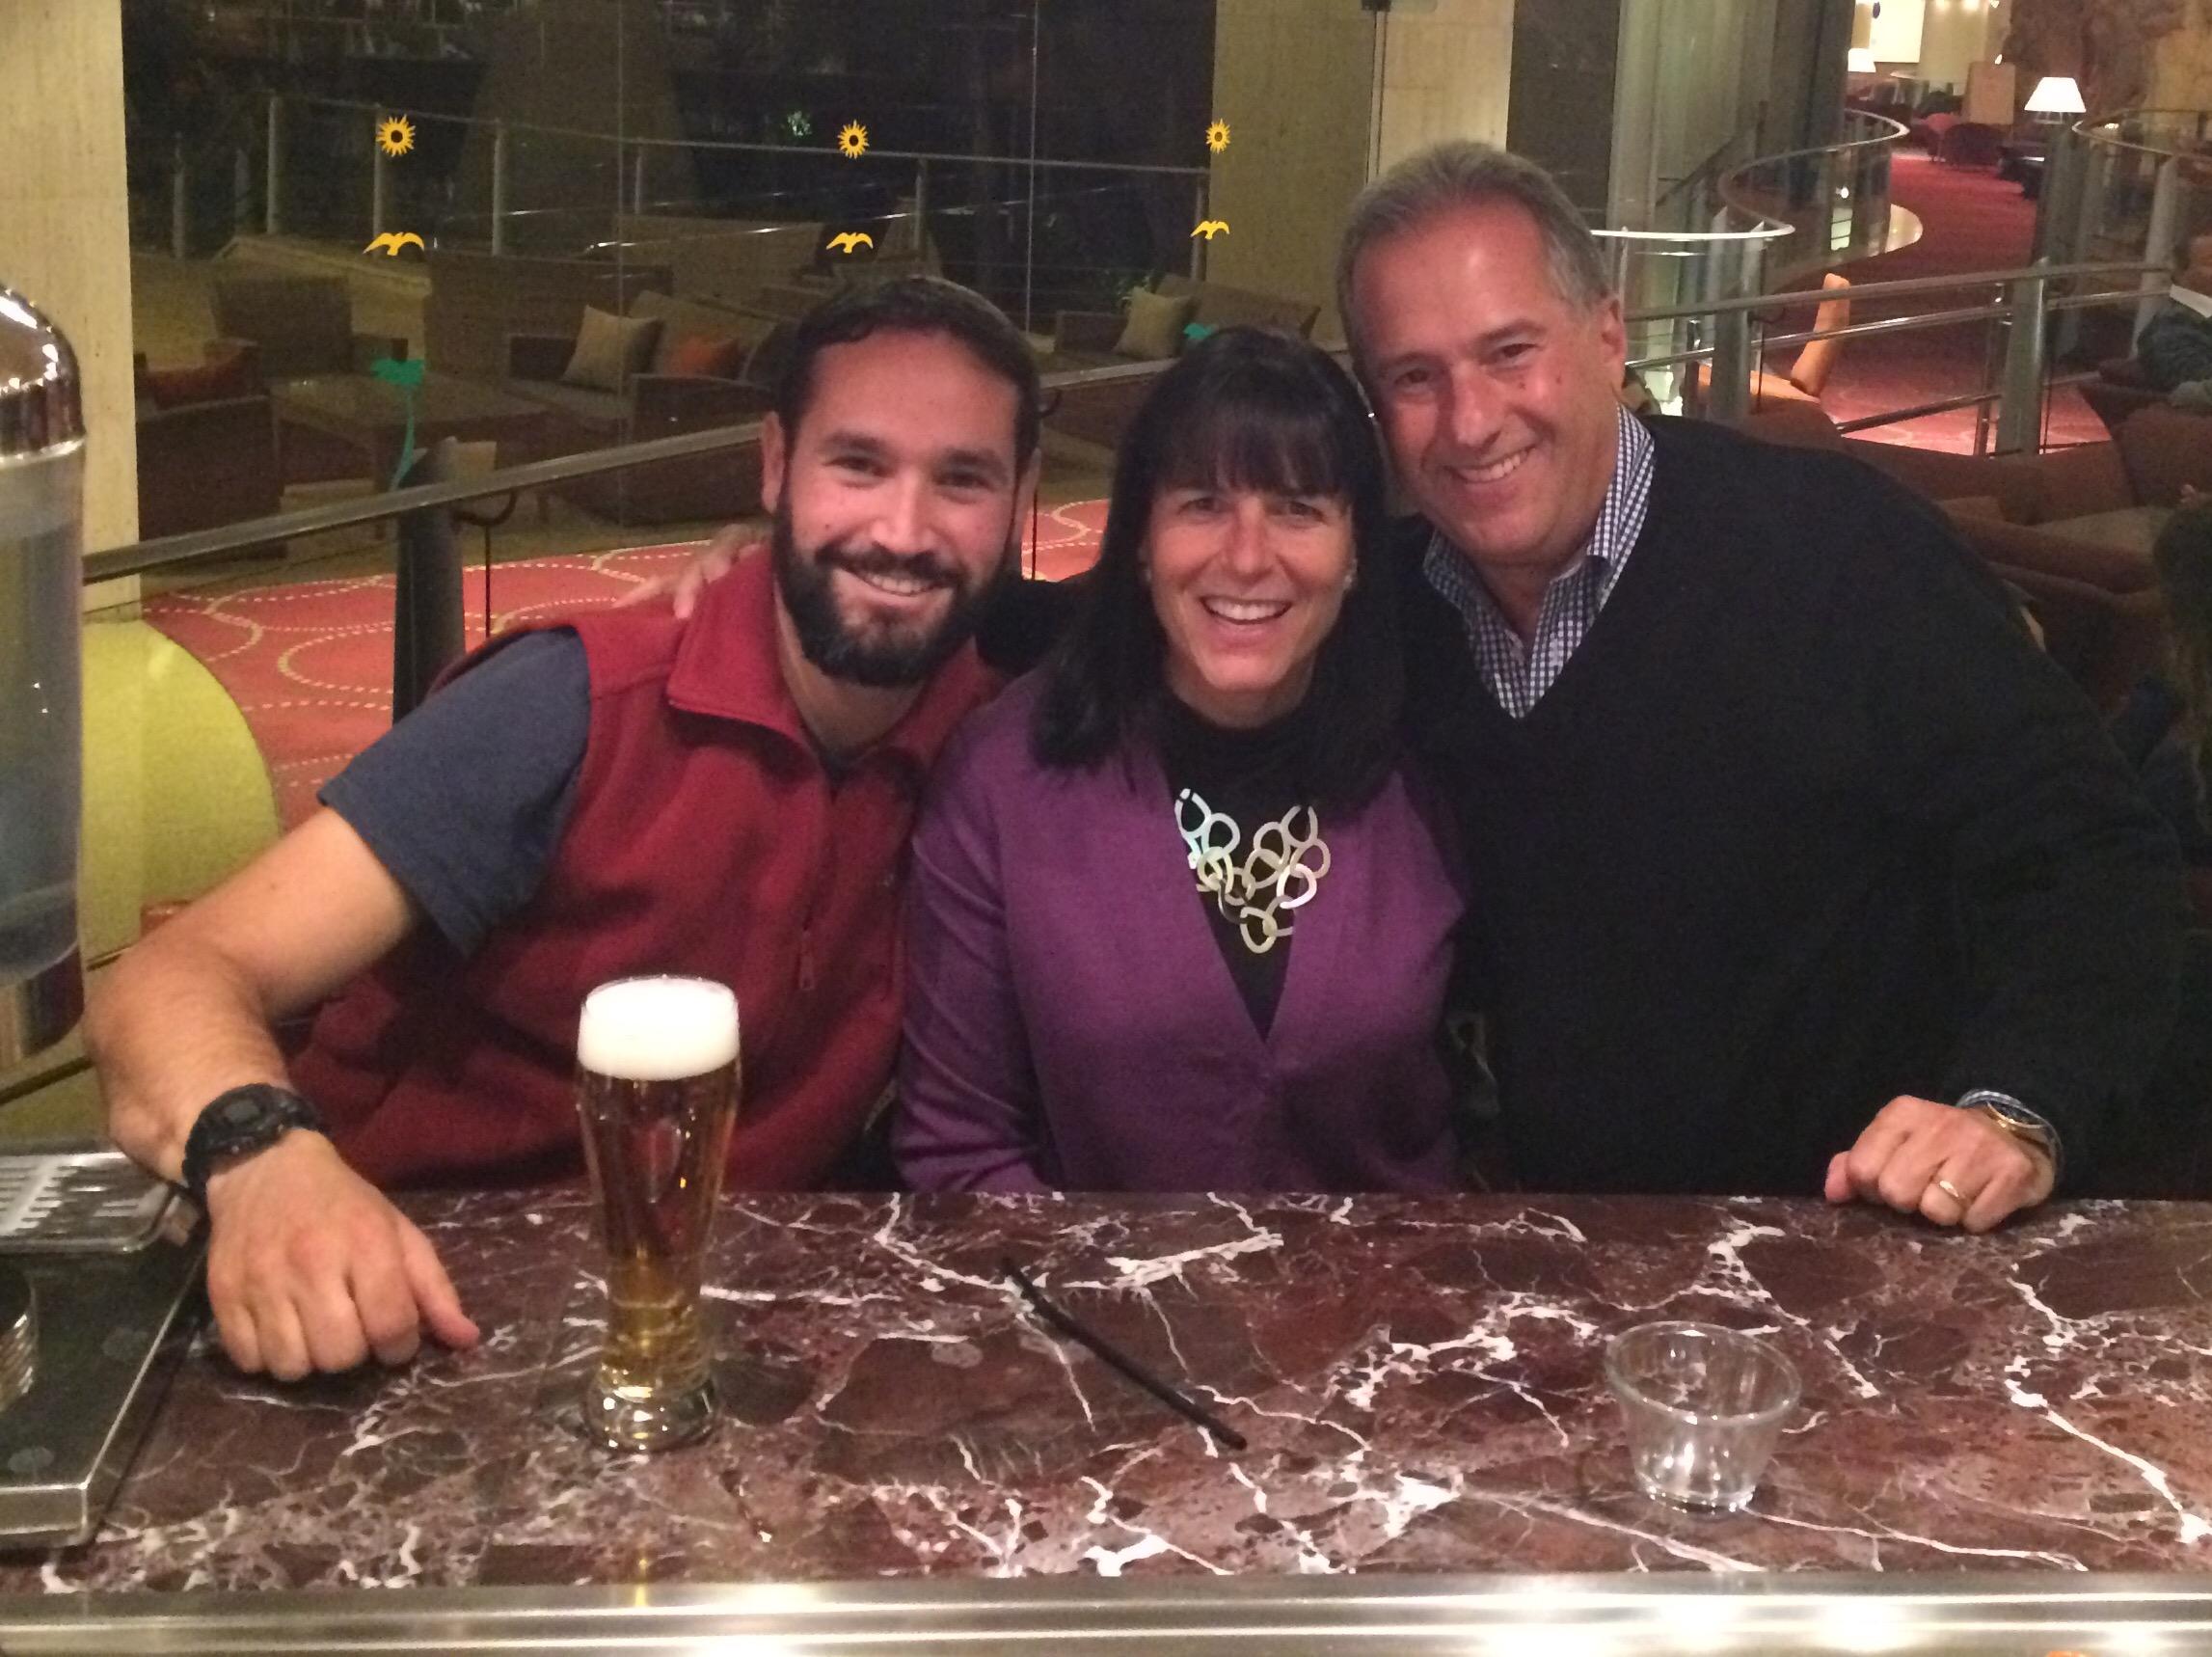 Robert & Jennifer, Israel and Jordan trip, October 2016